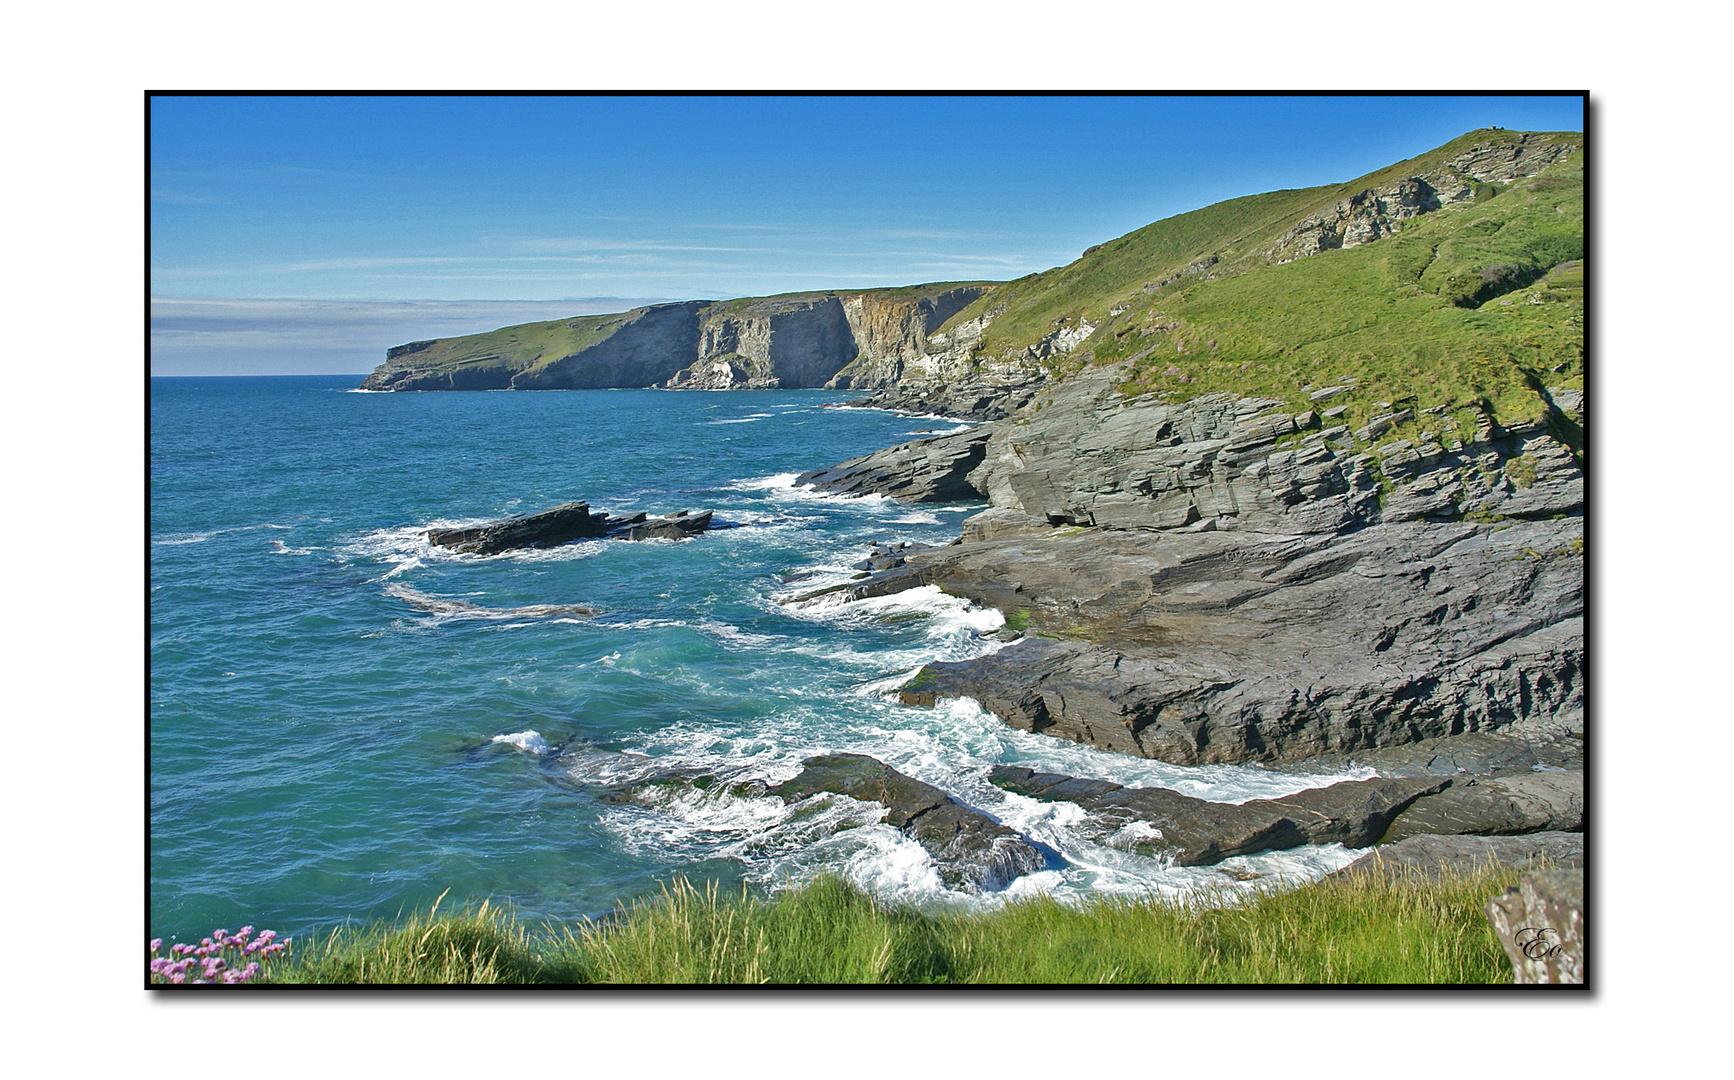 Cornwall I - Landschaft um Tintagel (Trebarwith)